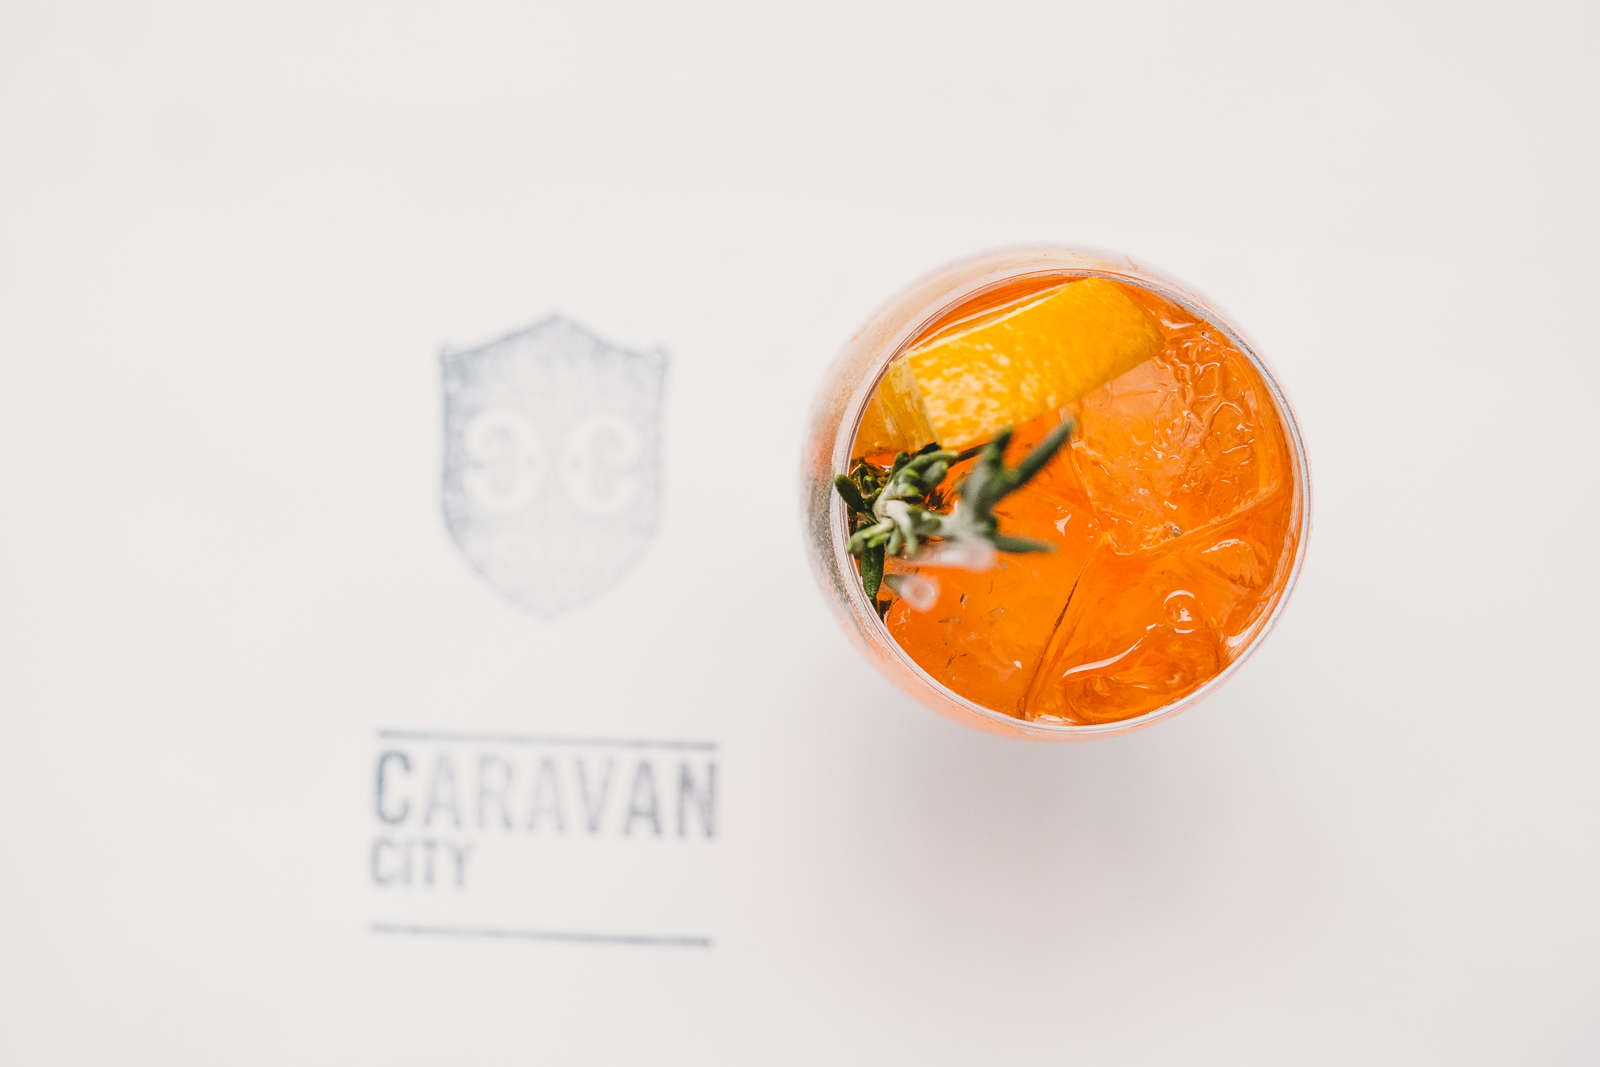 caravancity-02691.jpg